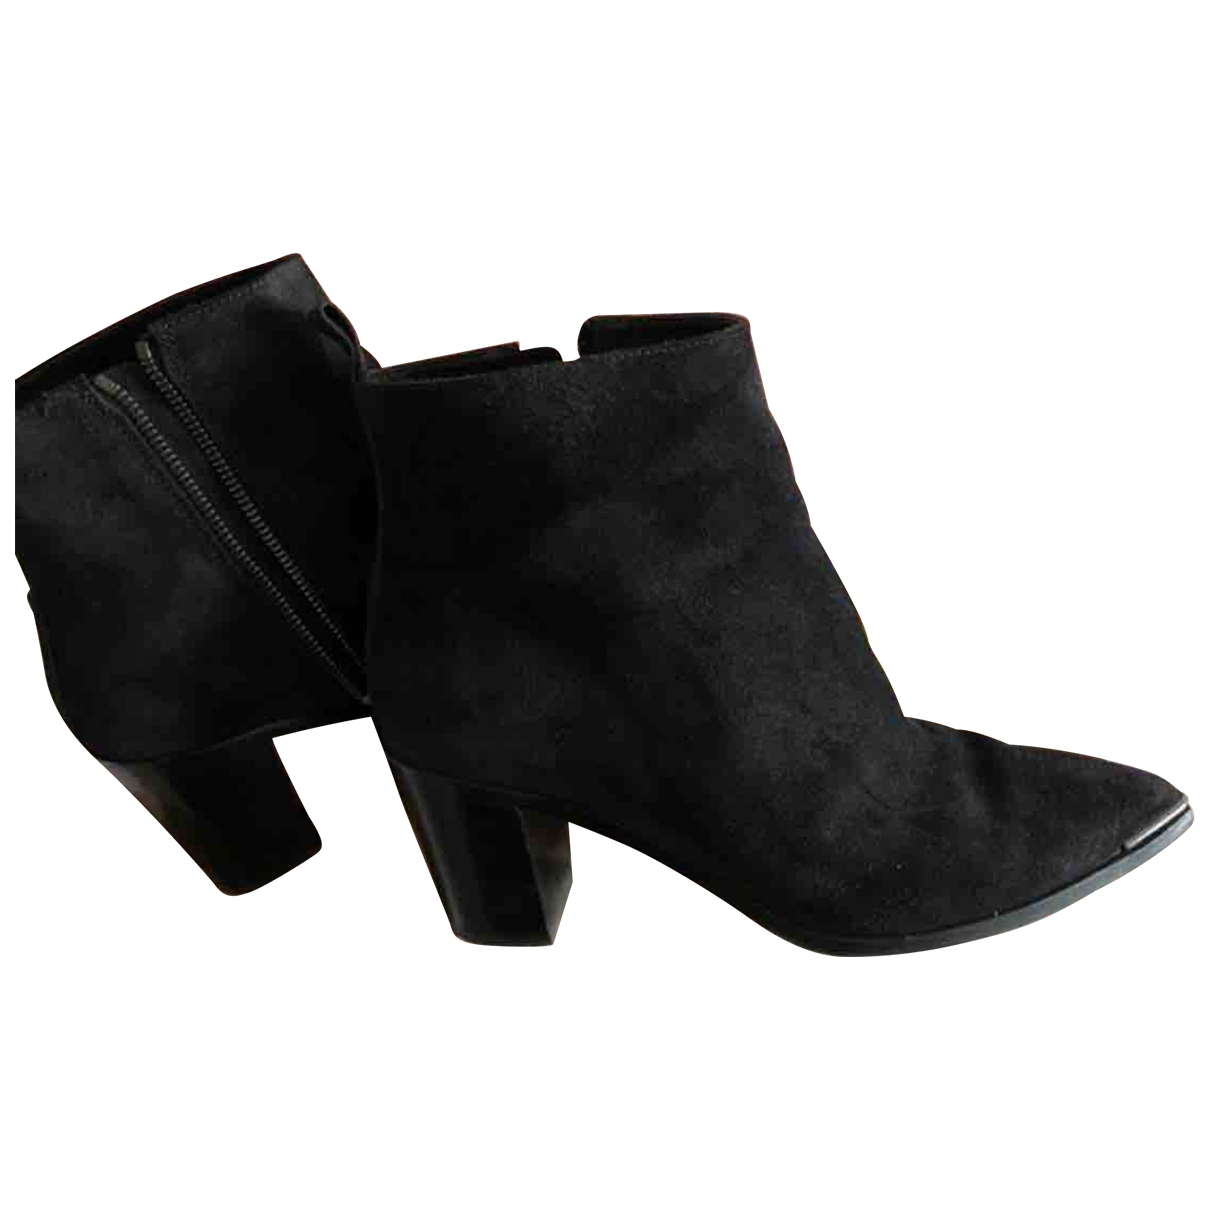 Acne Studios Loma boots